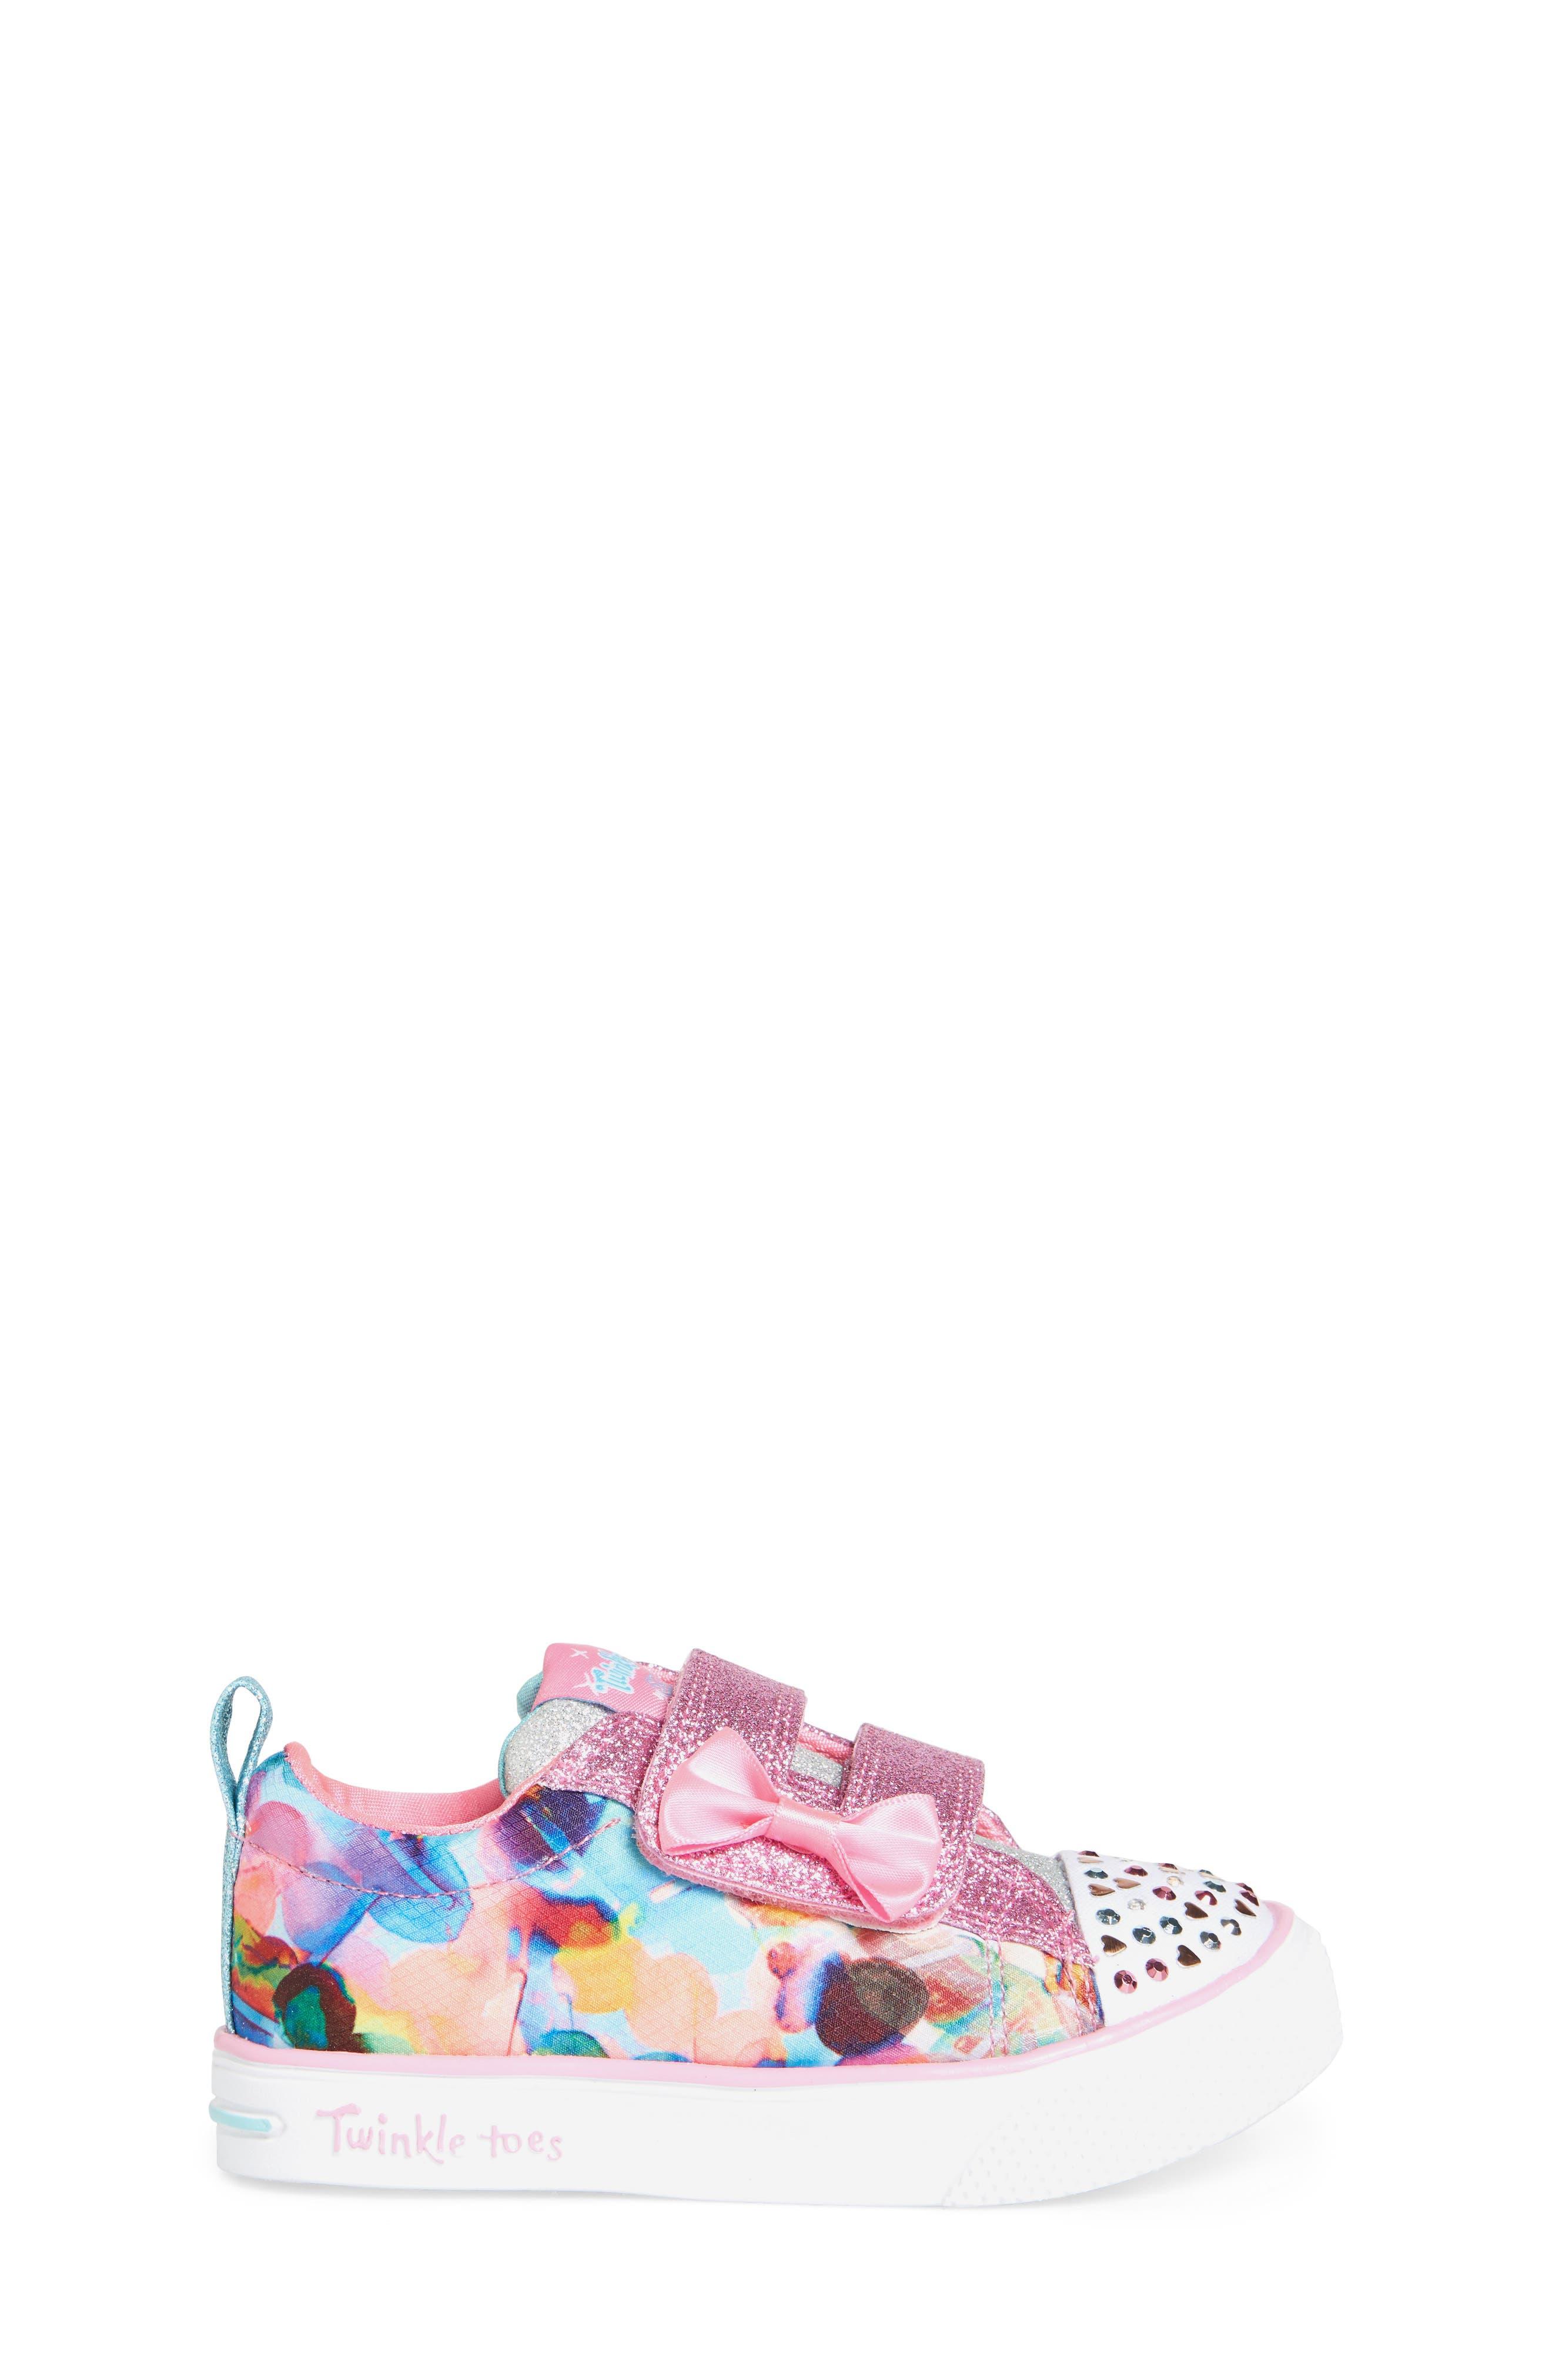 Twinkle Breeze 2.0 Princess Sneaker,                             Alternate thumbnail 3, color,                             Multi